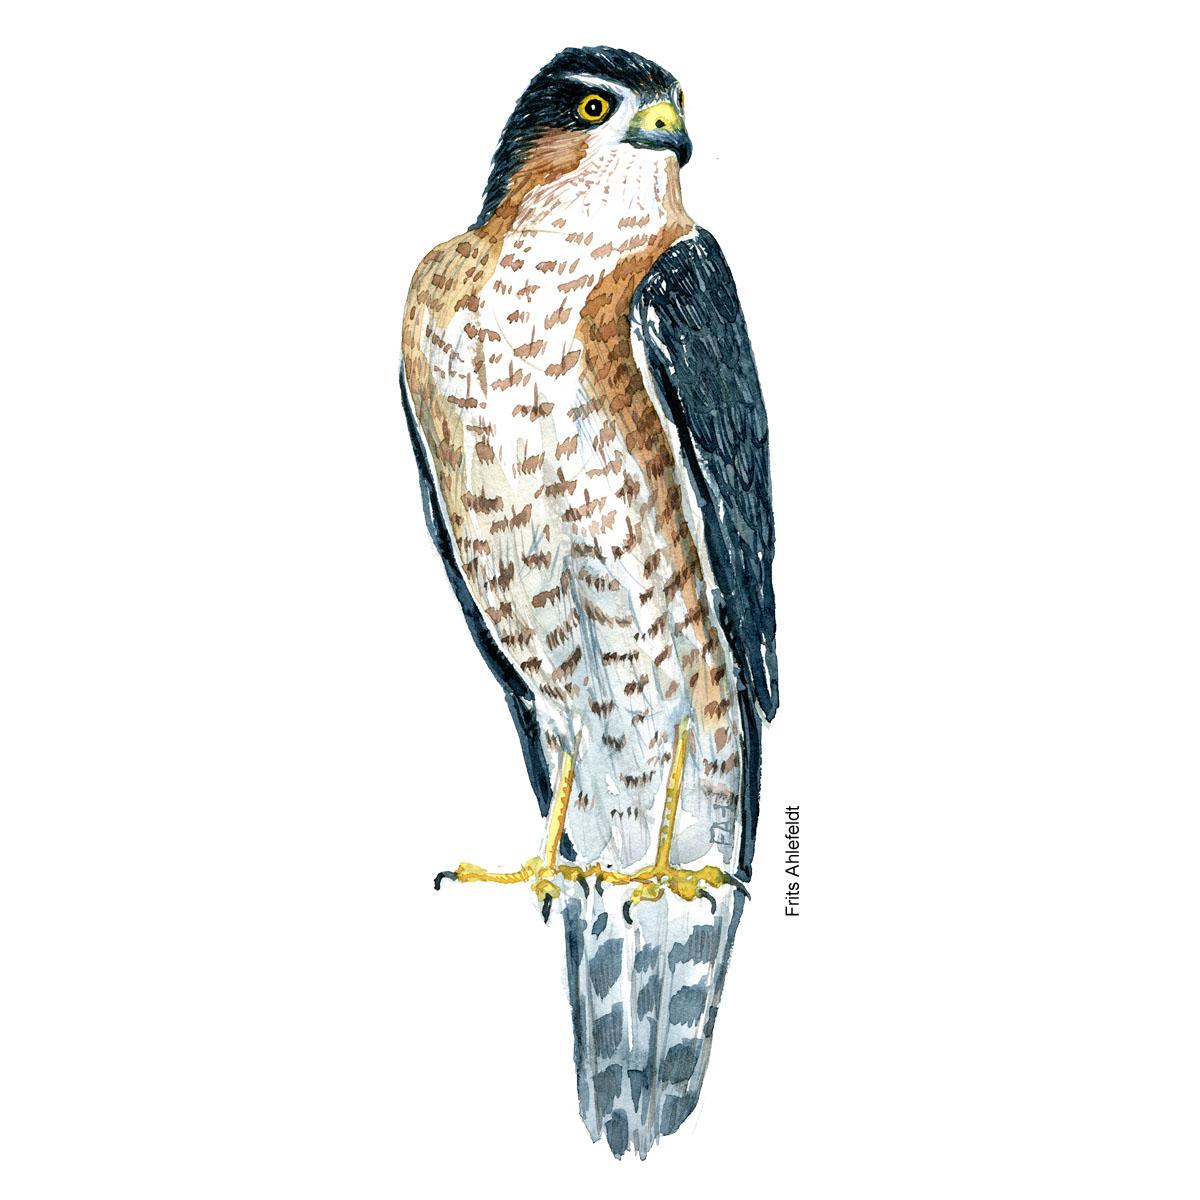 Spurvehoeg - Eurasian sparrow hawk bird watercolor painting. Artwork by Frits Ahlefeldt. Fugle akvarel